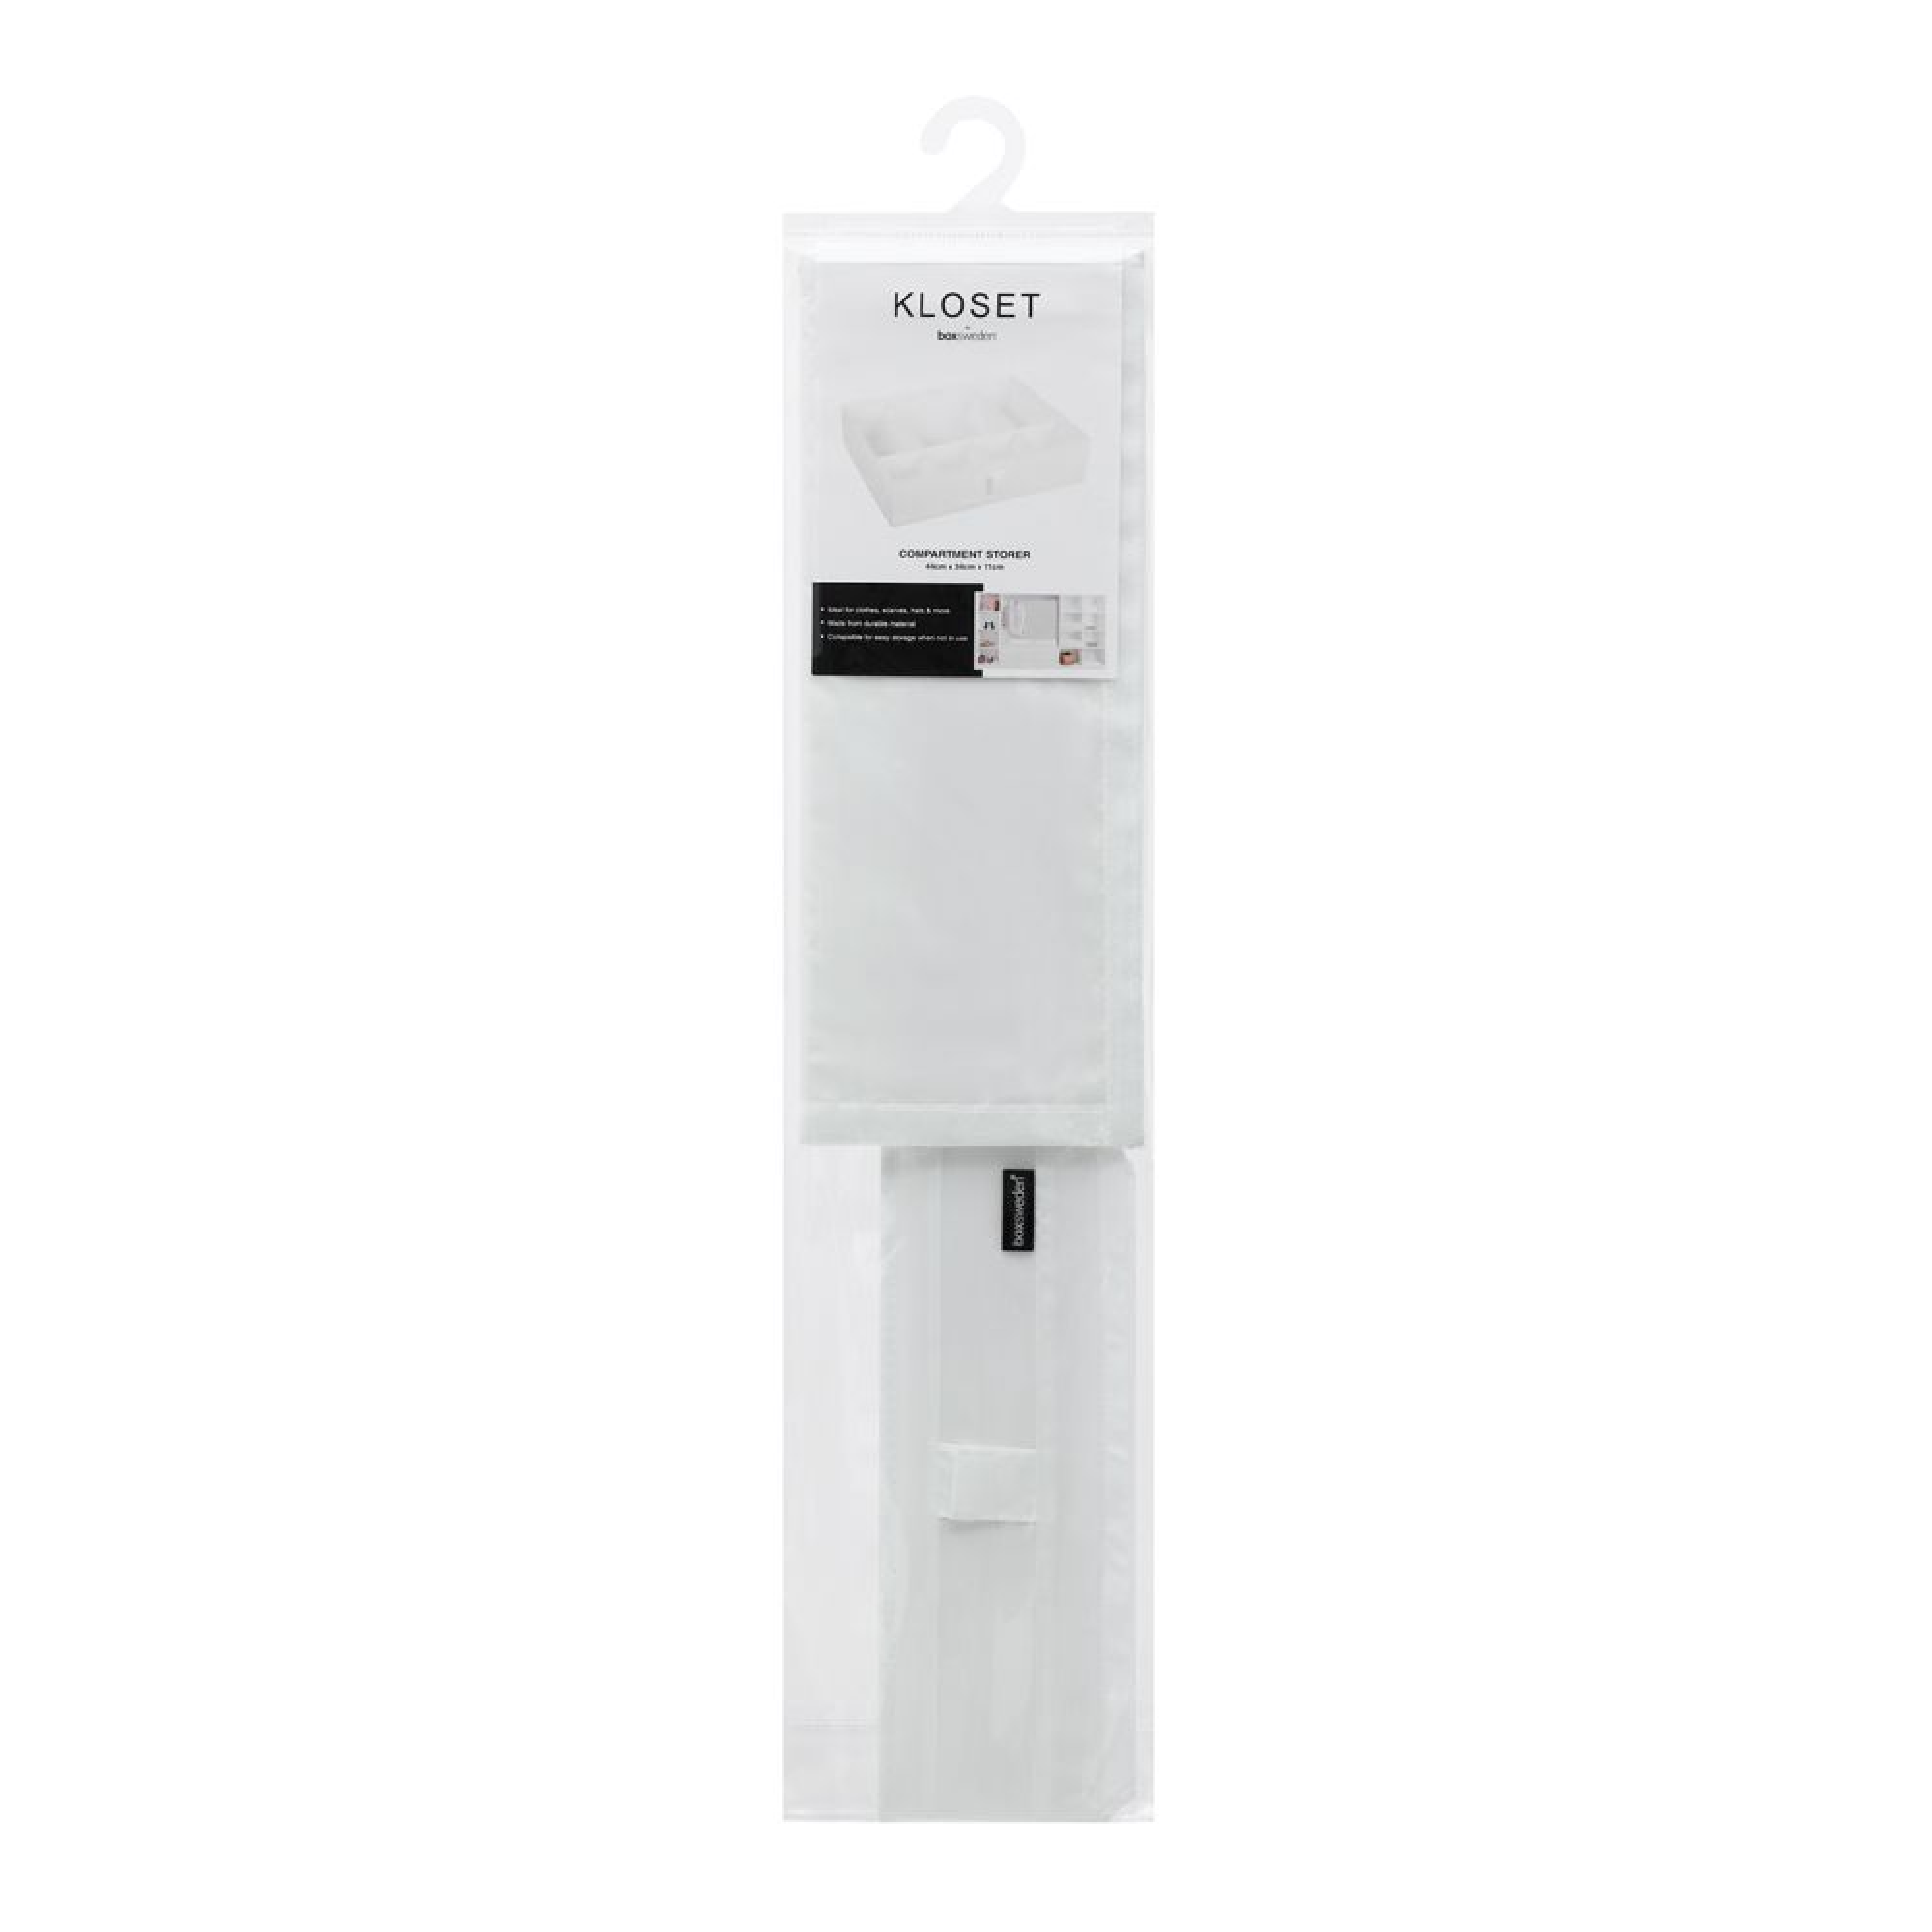 Kloset Soft Storage Compartment White 44 x 34 x 11cm   Home Storage & Living